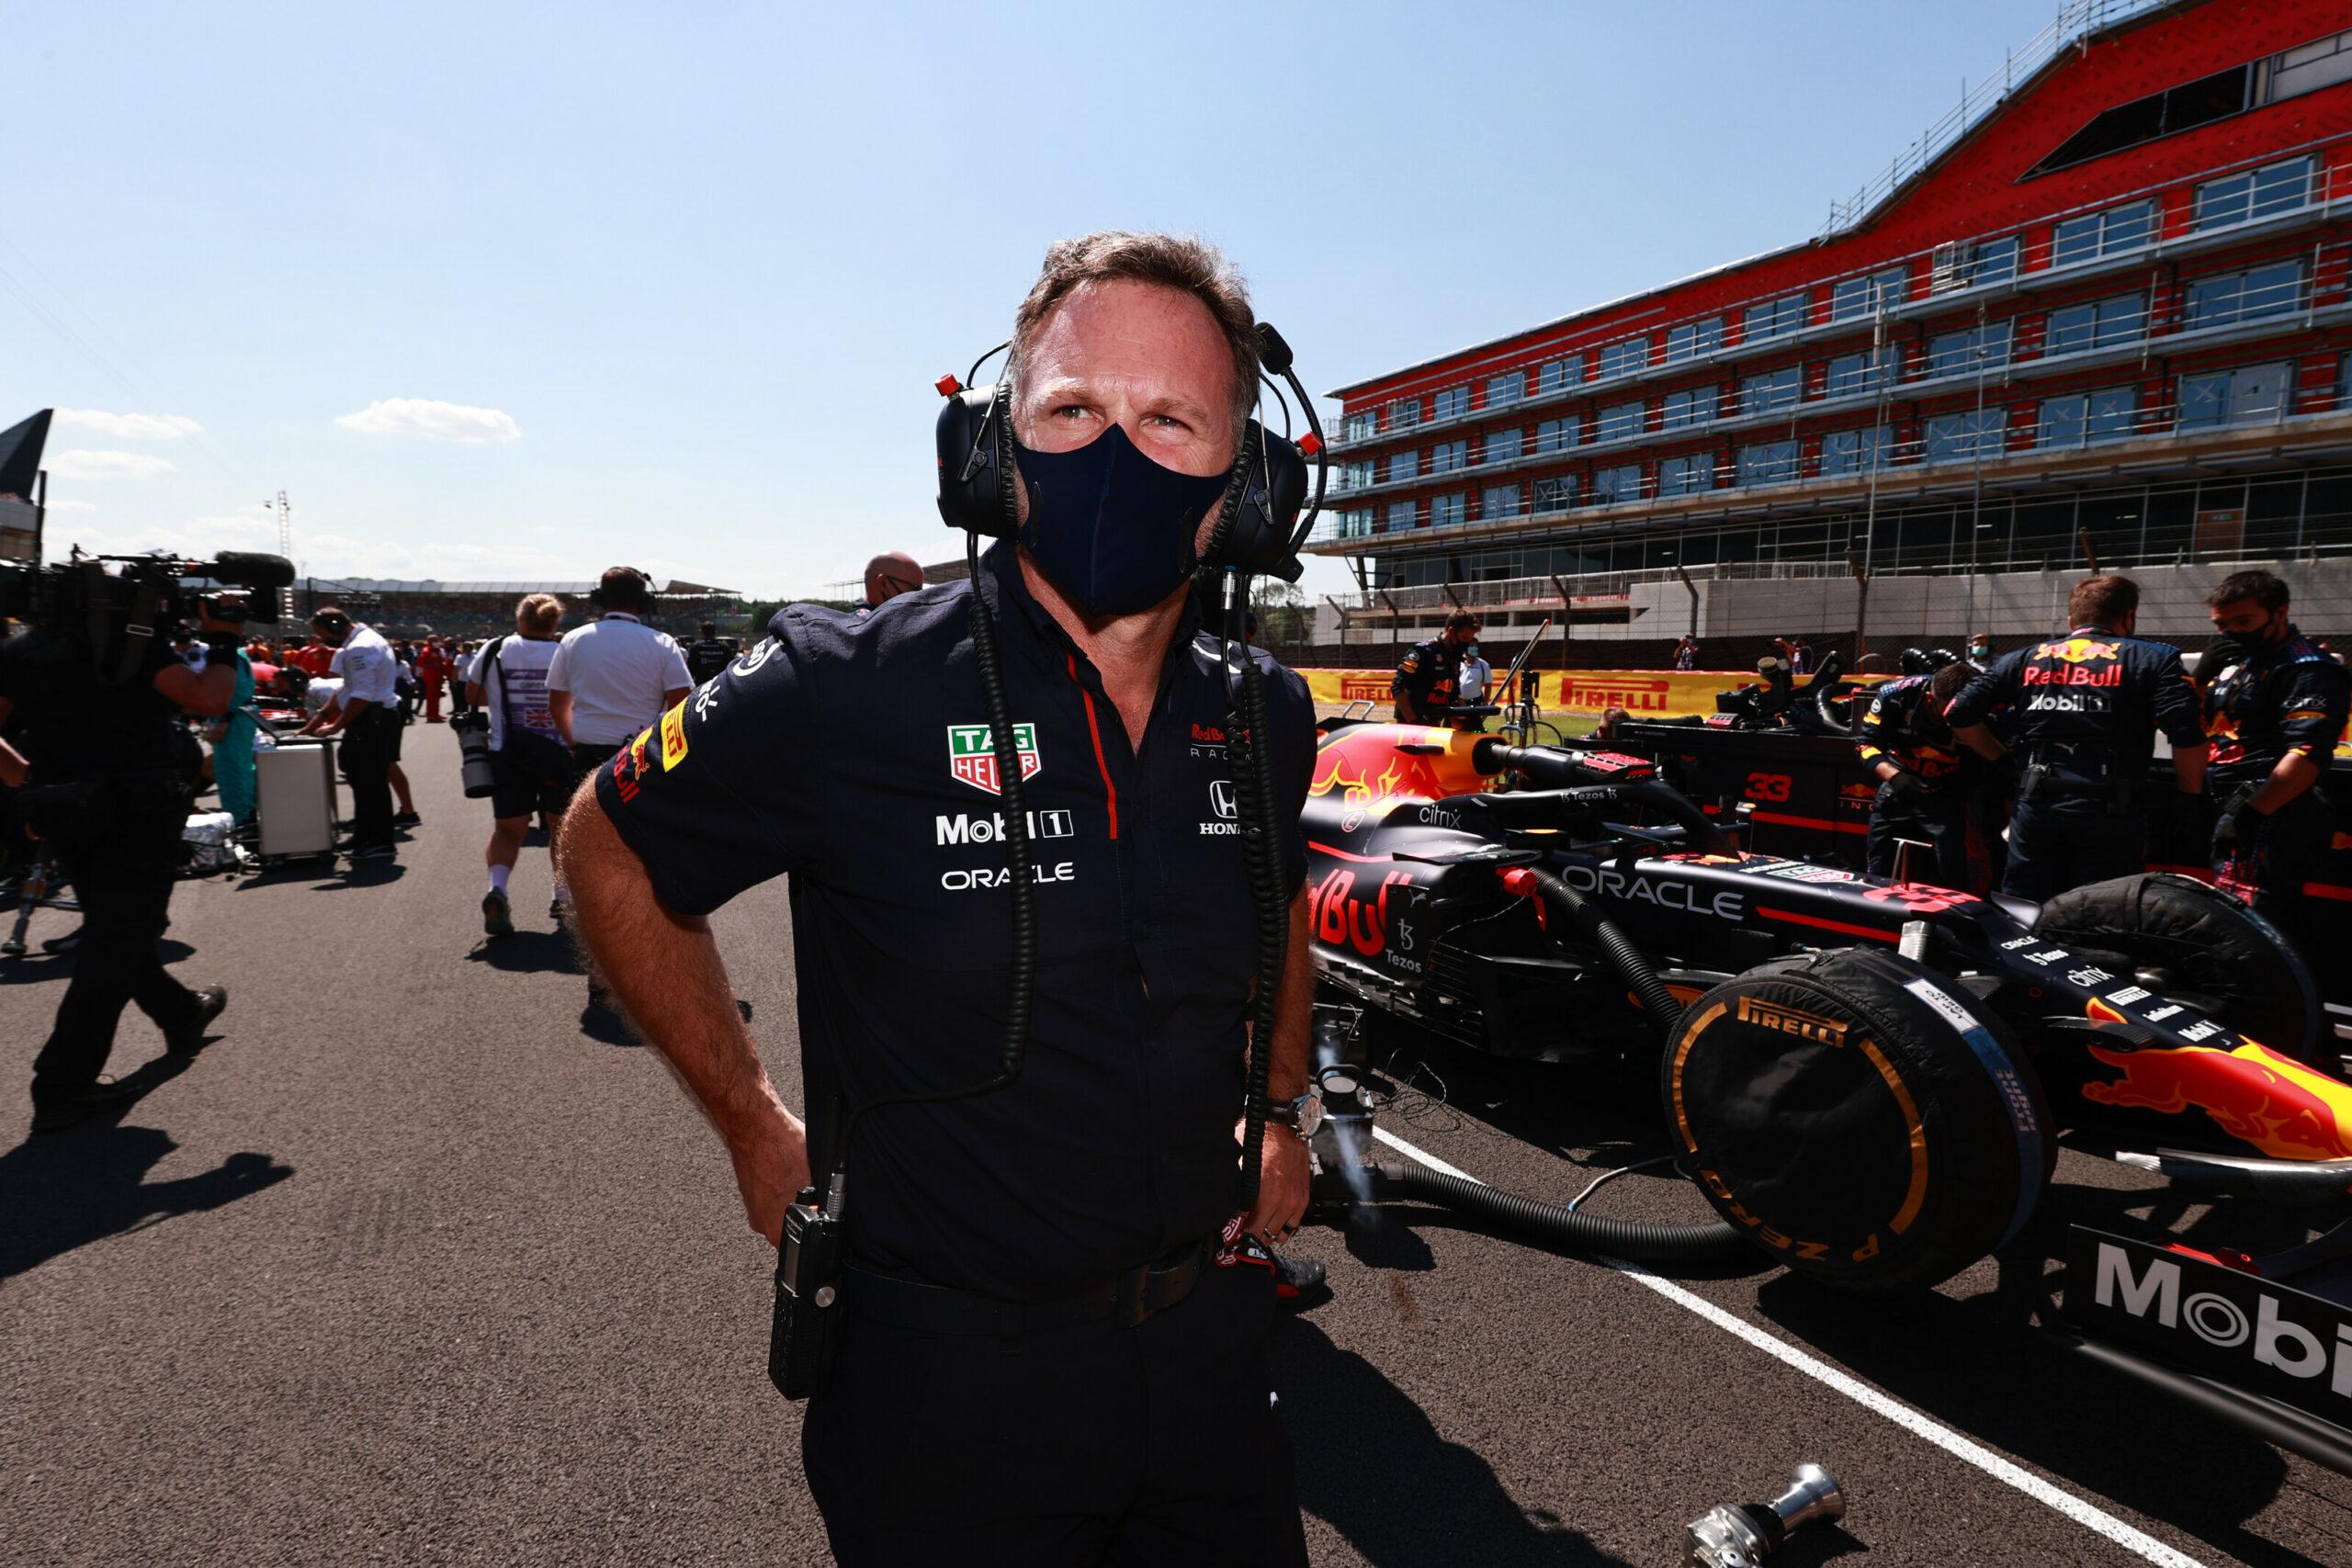 F1 - Insultes racistes : Horner prône la tolérance zéro